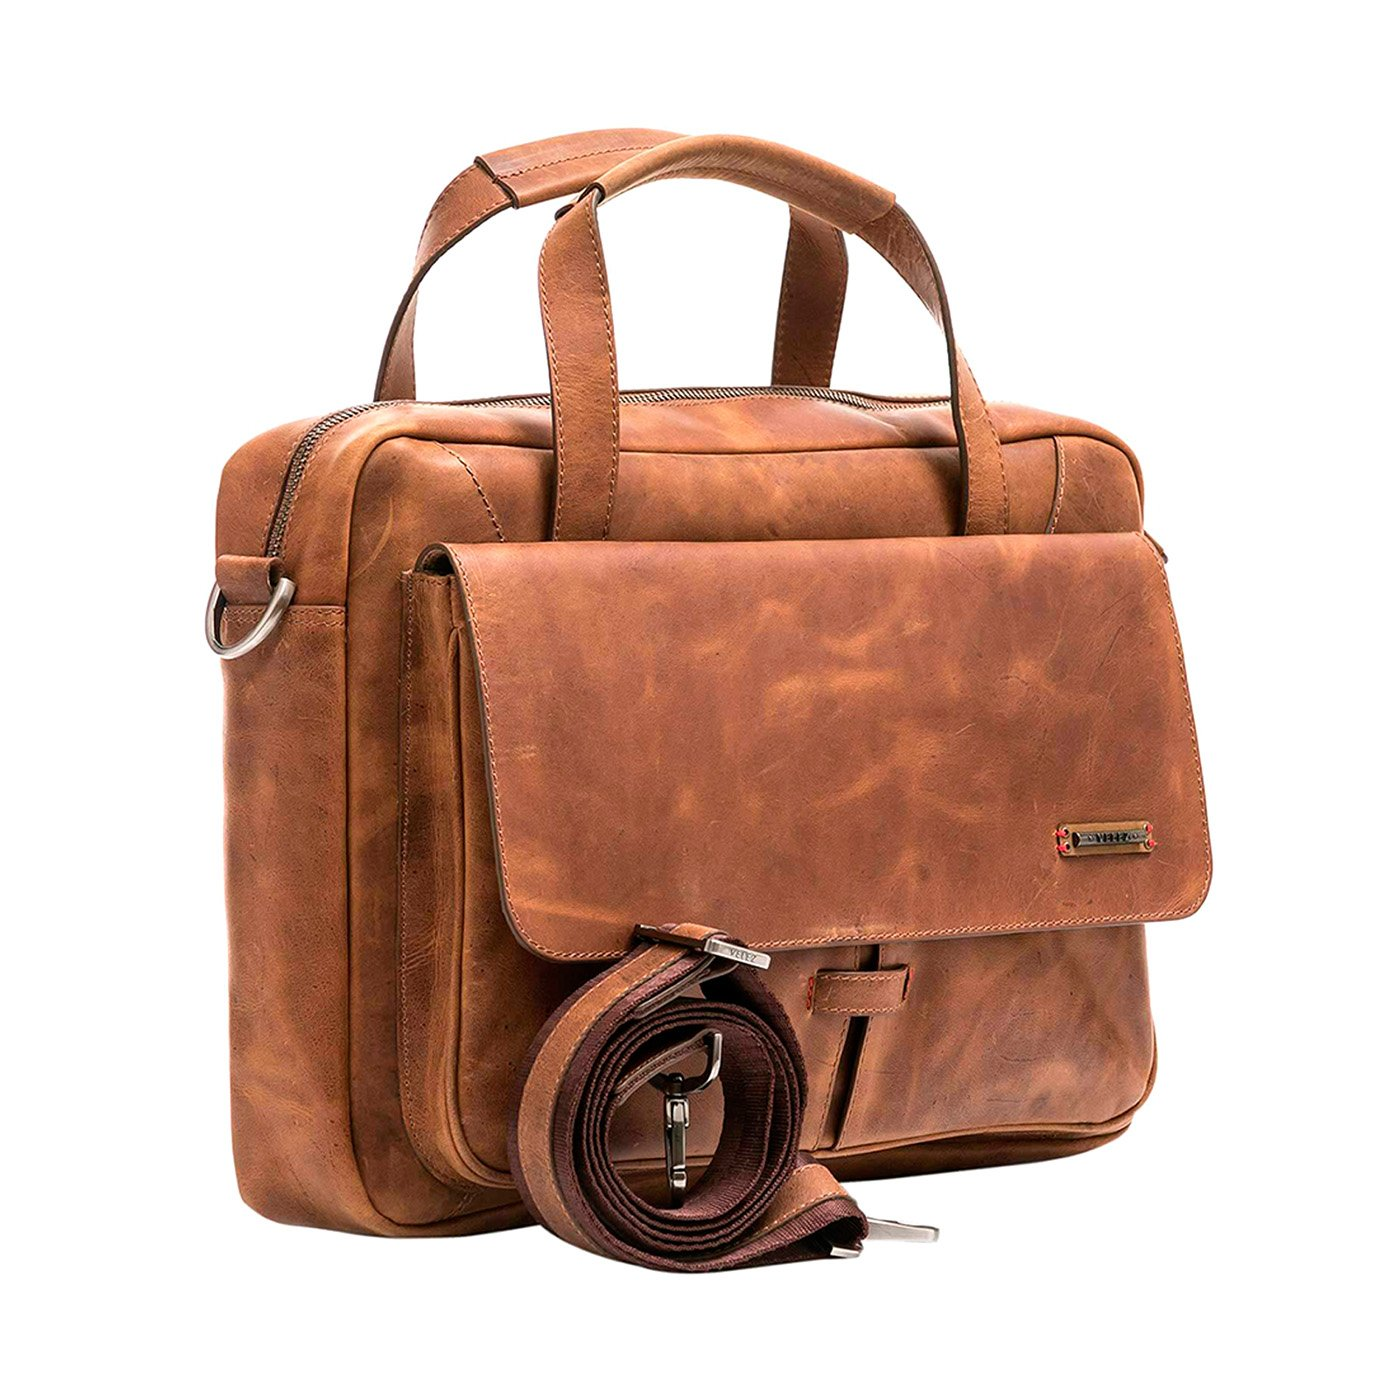 ... Genuine Colombian Leather Business Travel Briefcase Laptop Crossbody Messenger Bag | Maletin y Bolso de Cuero Colombiano para Hombres Honey | Briefcases